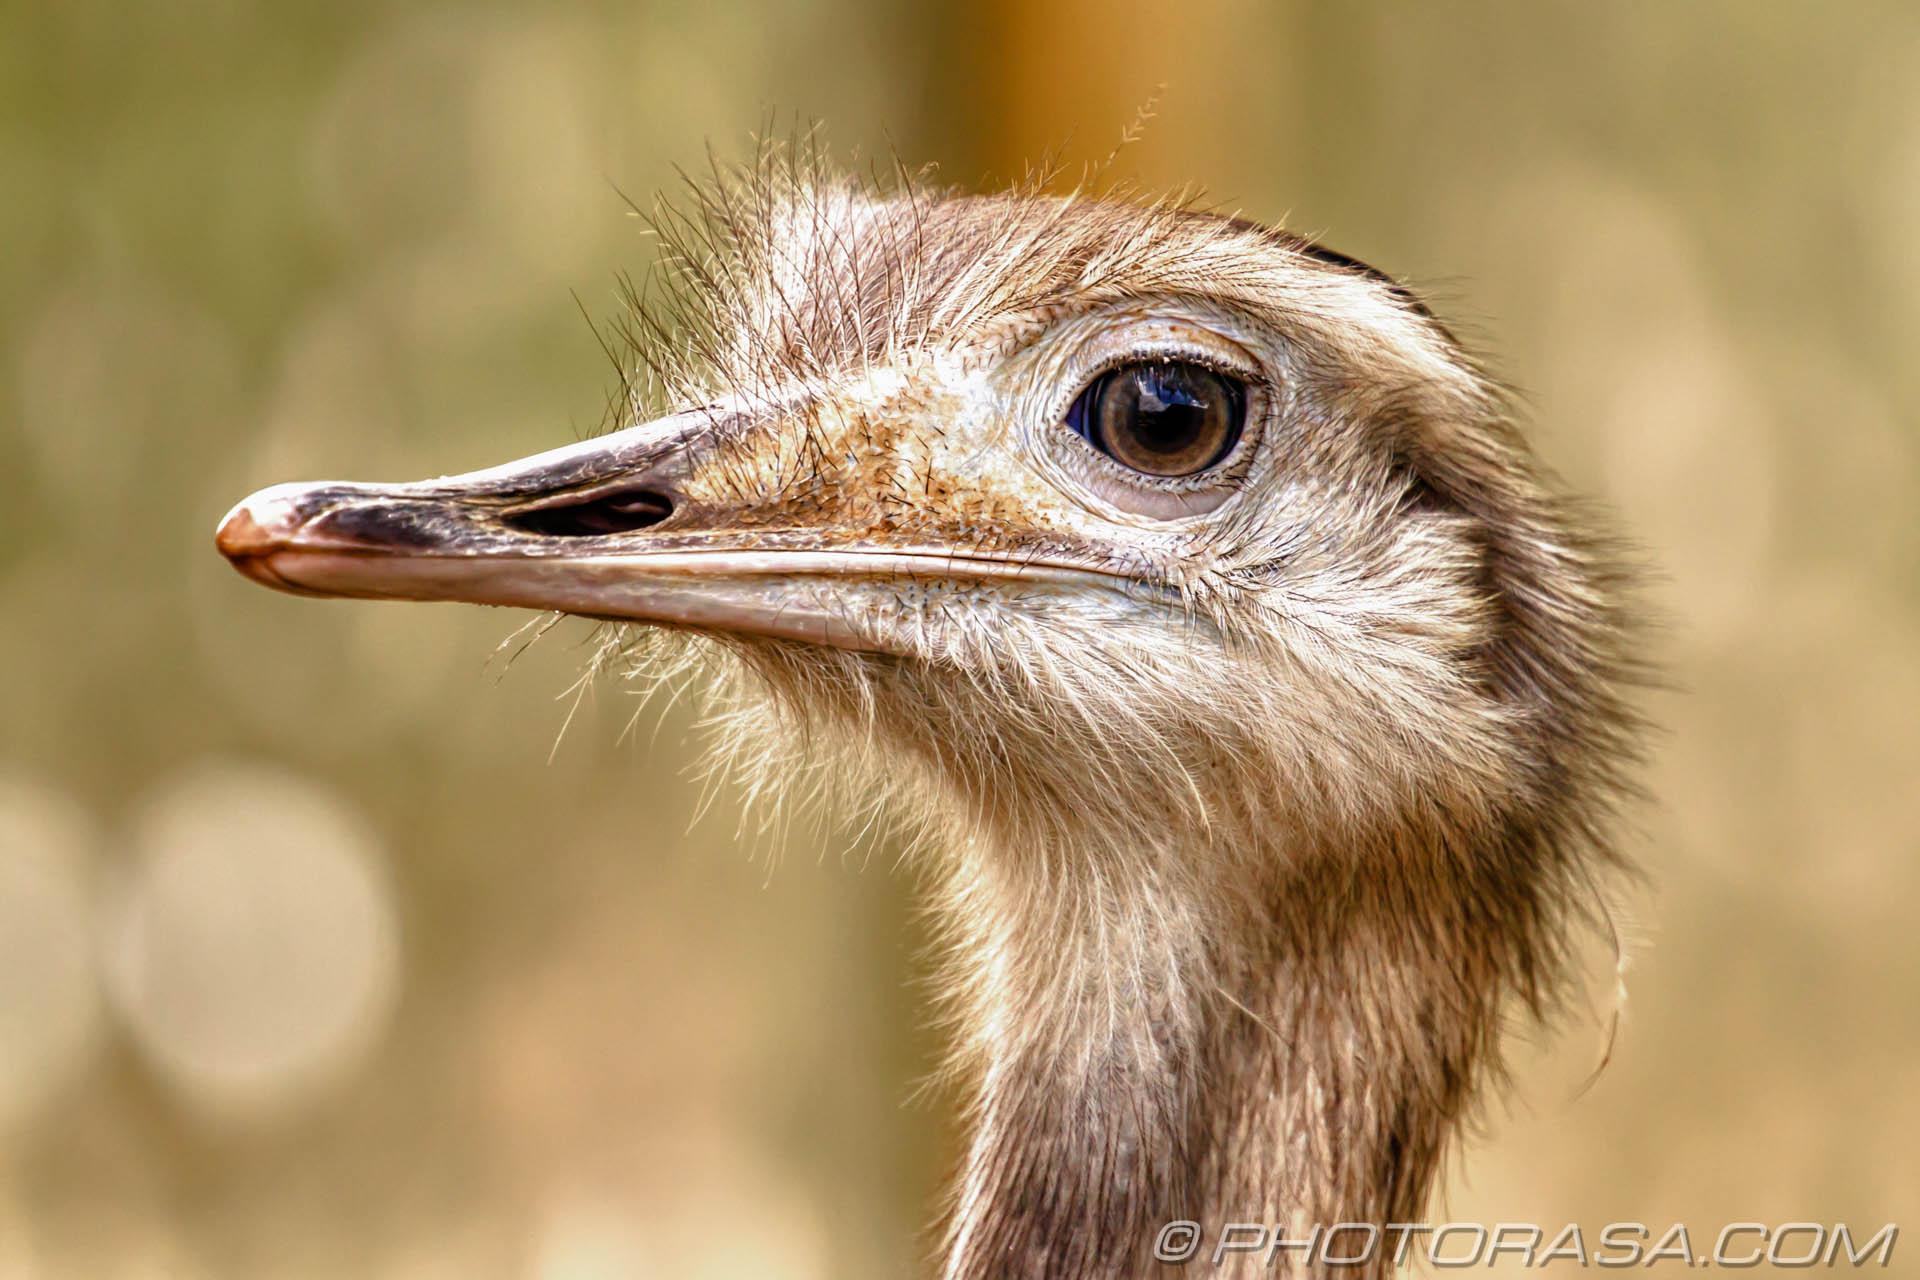 https://photorasa.com/birds-greenworld/greater-rhea-close-up/